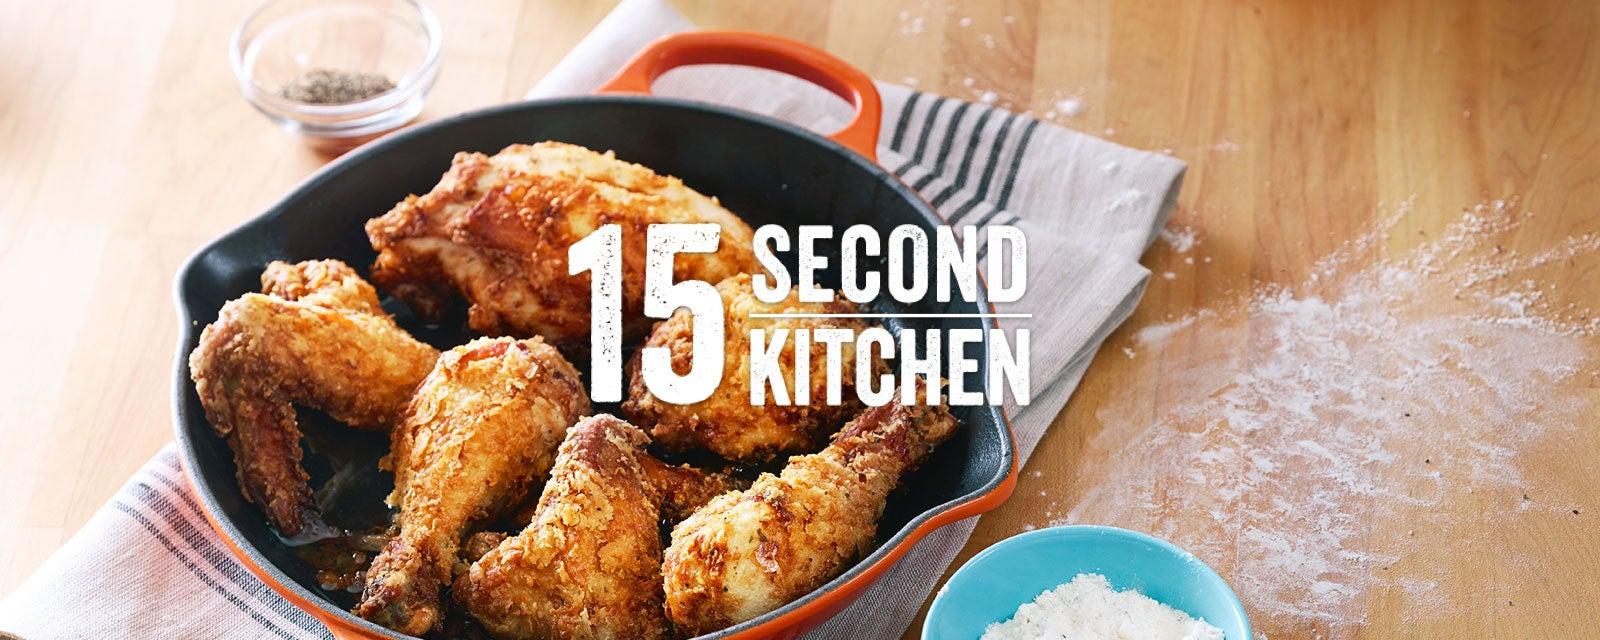 Hidden Valley 174 Ranch Fried Chicken Recipe Video Hidden Valley 174